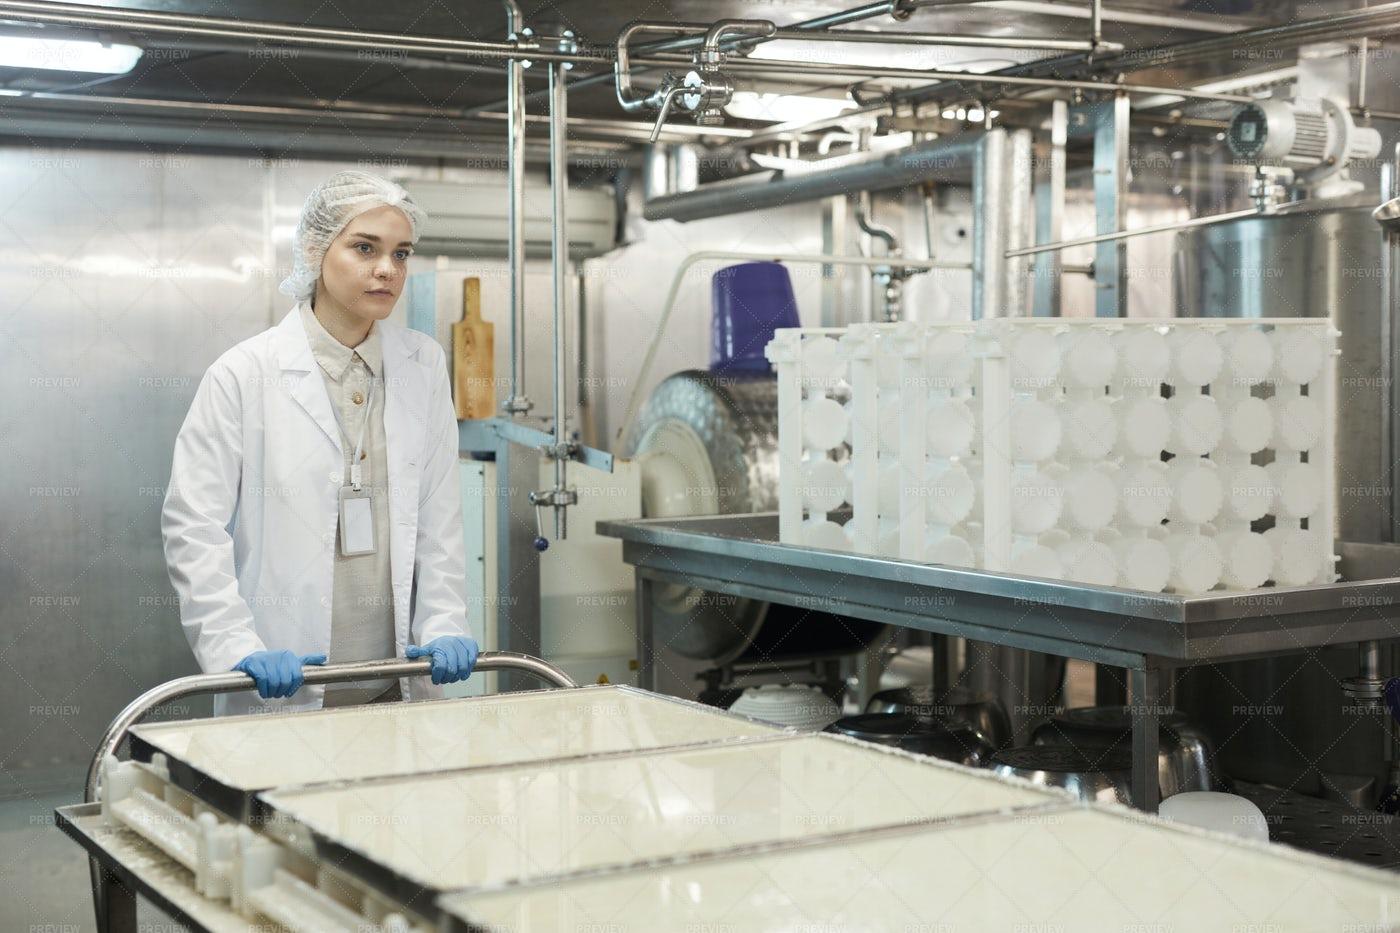 Pushing Cart At Food Factory: Stock Photos